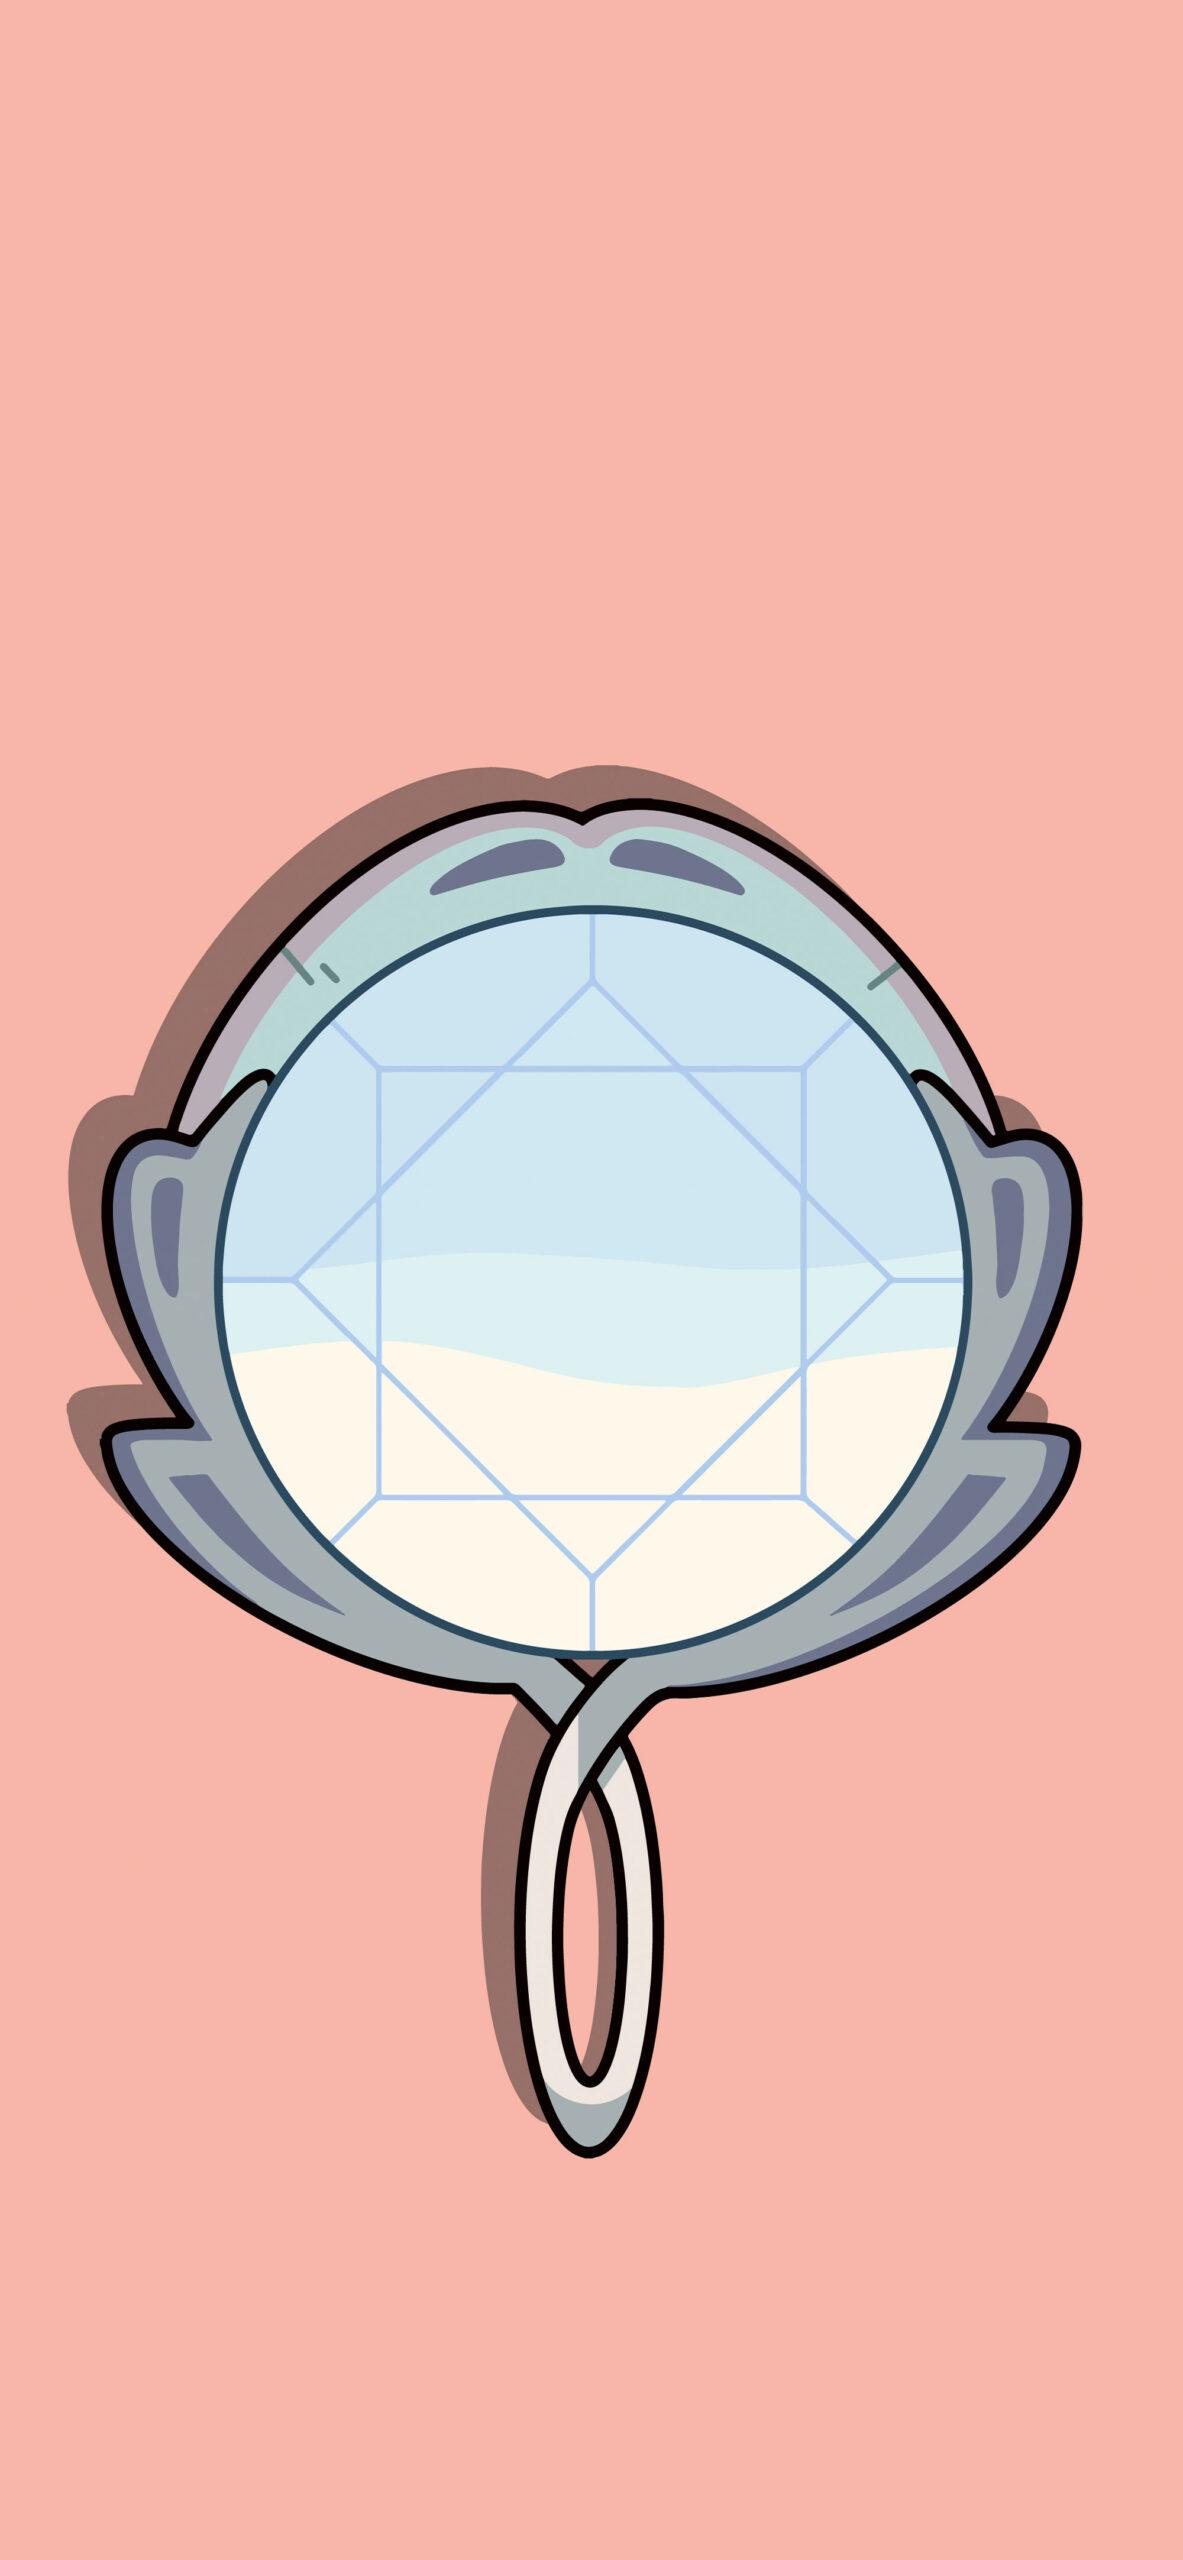 steven universe mirror wallpaper 3